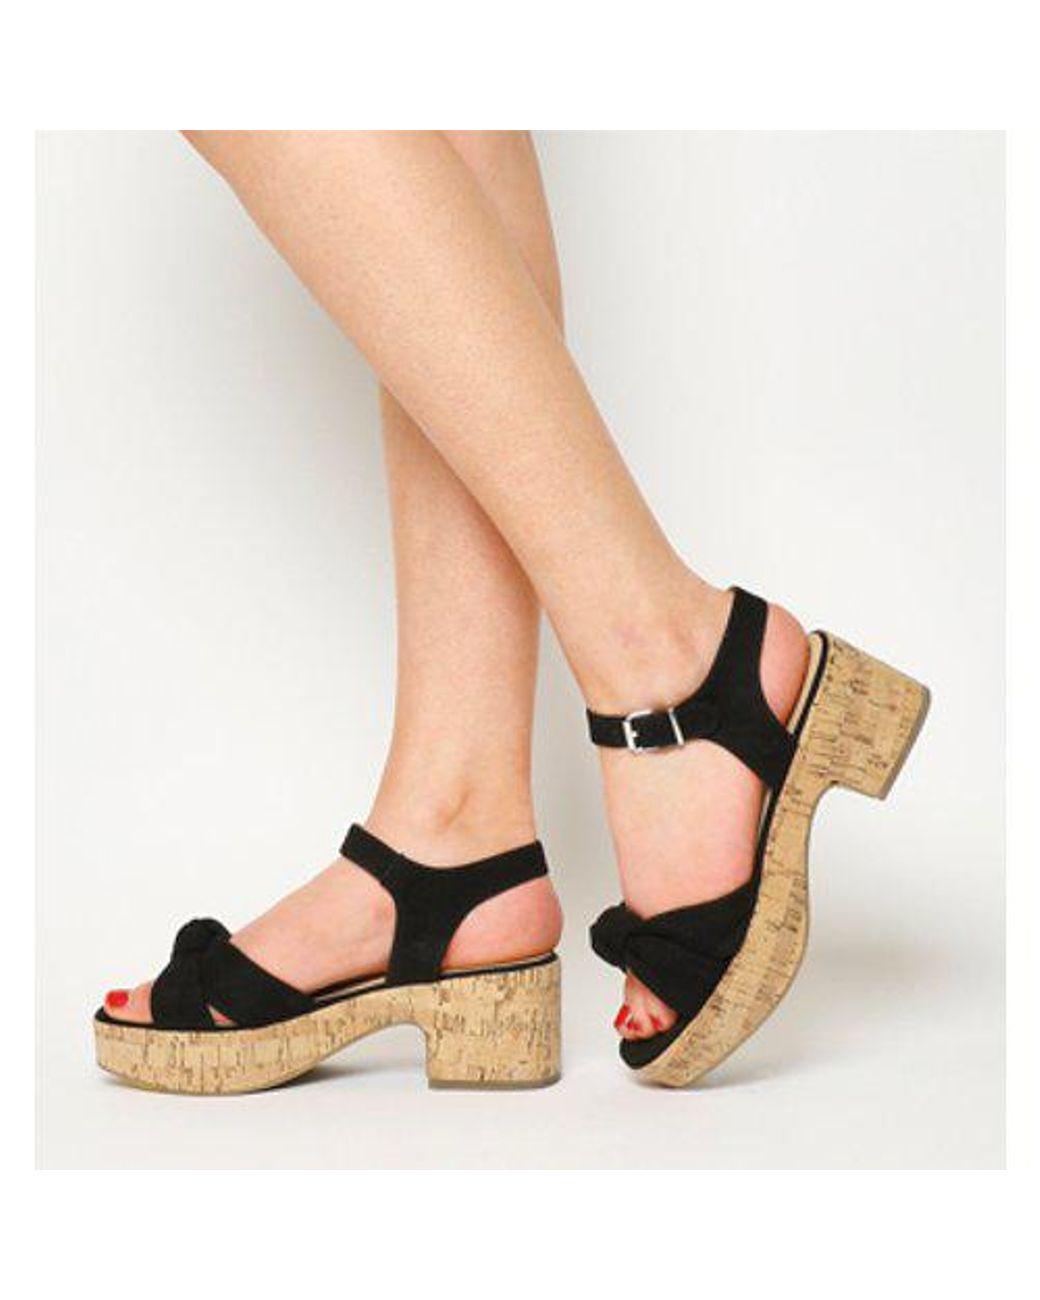 d3aea7d68401 Lyst - Office Magnolia Demi Flatform Sandal in Black